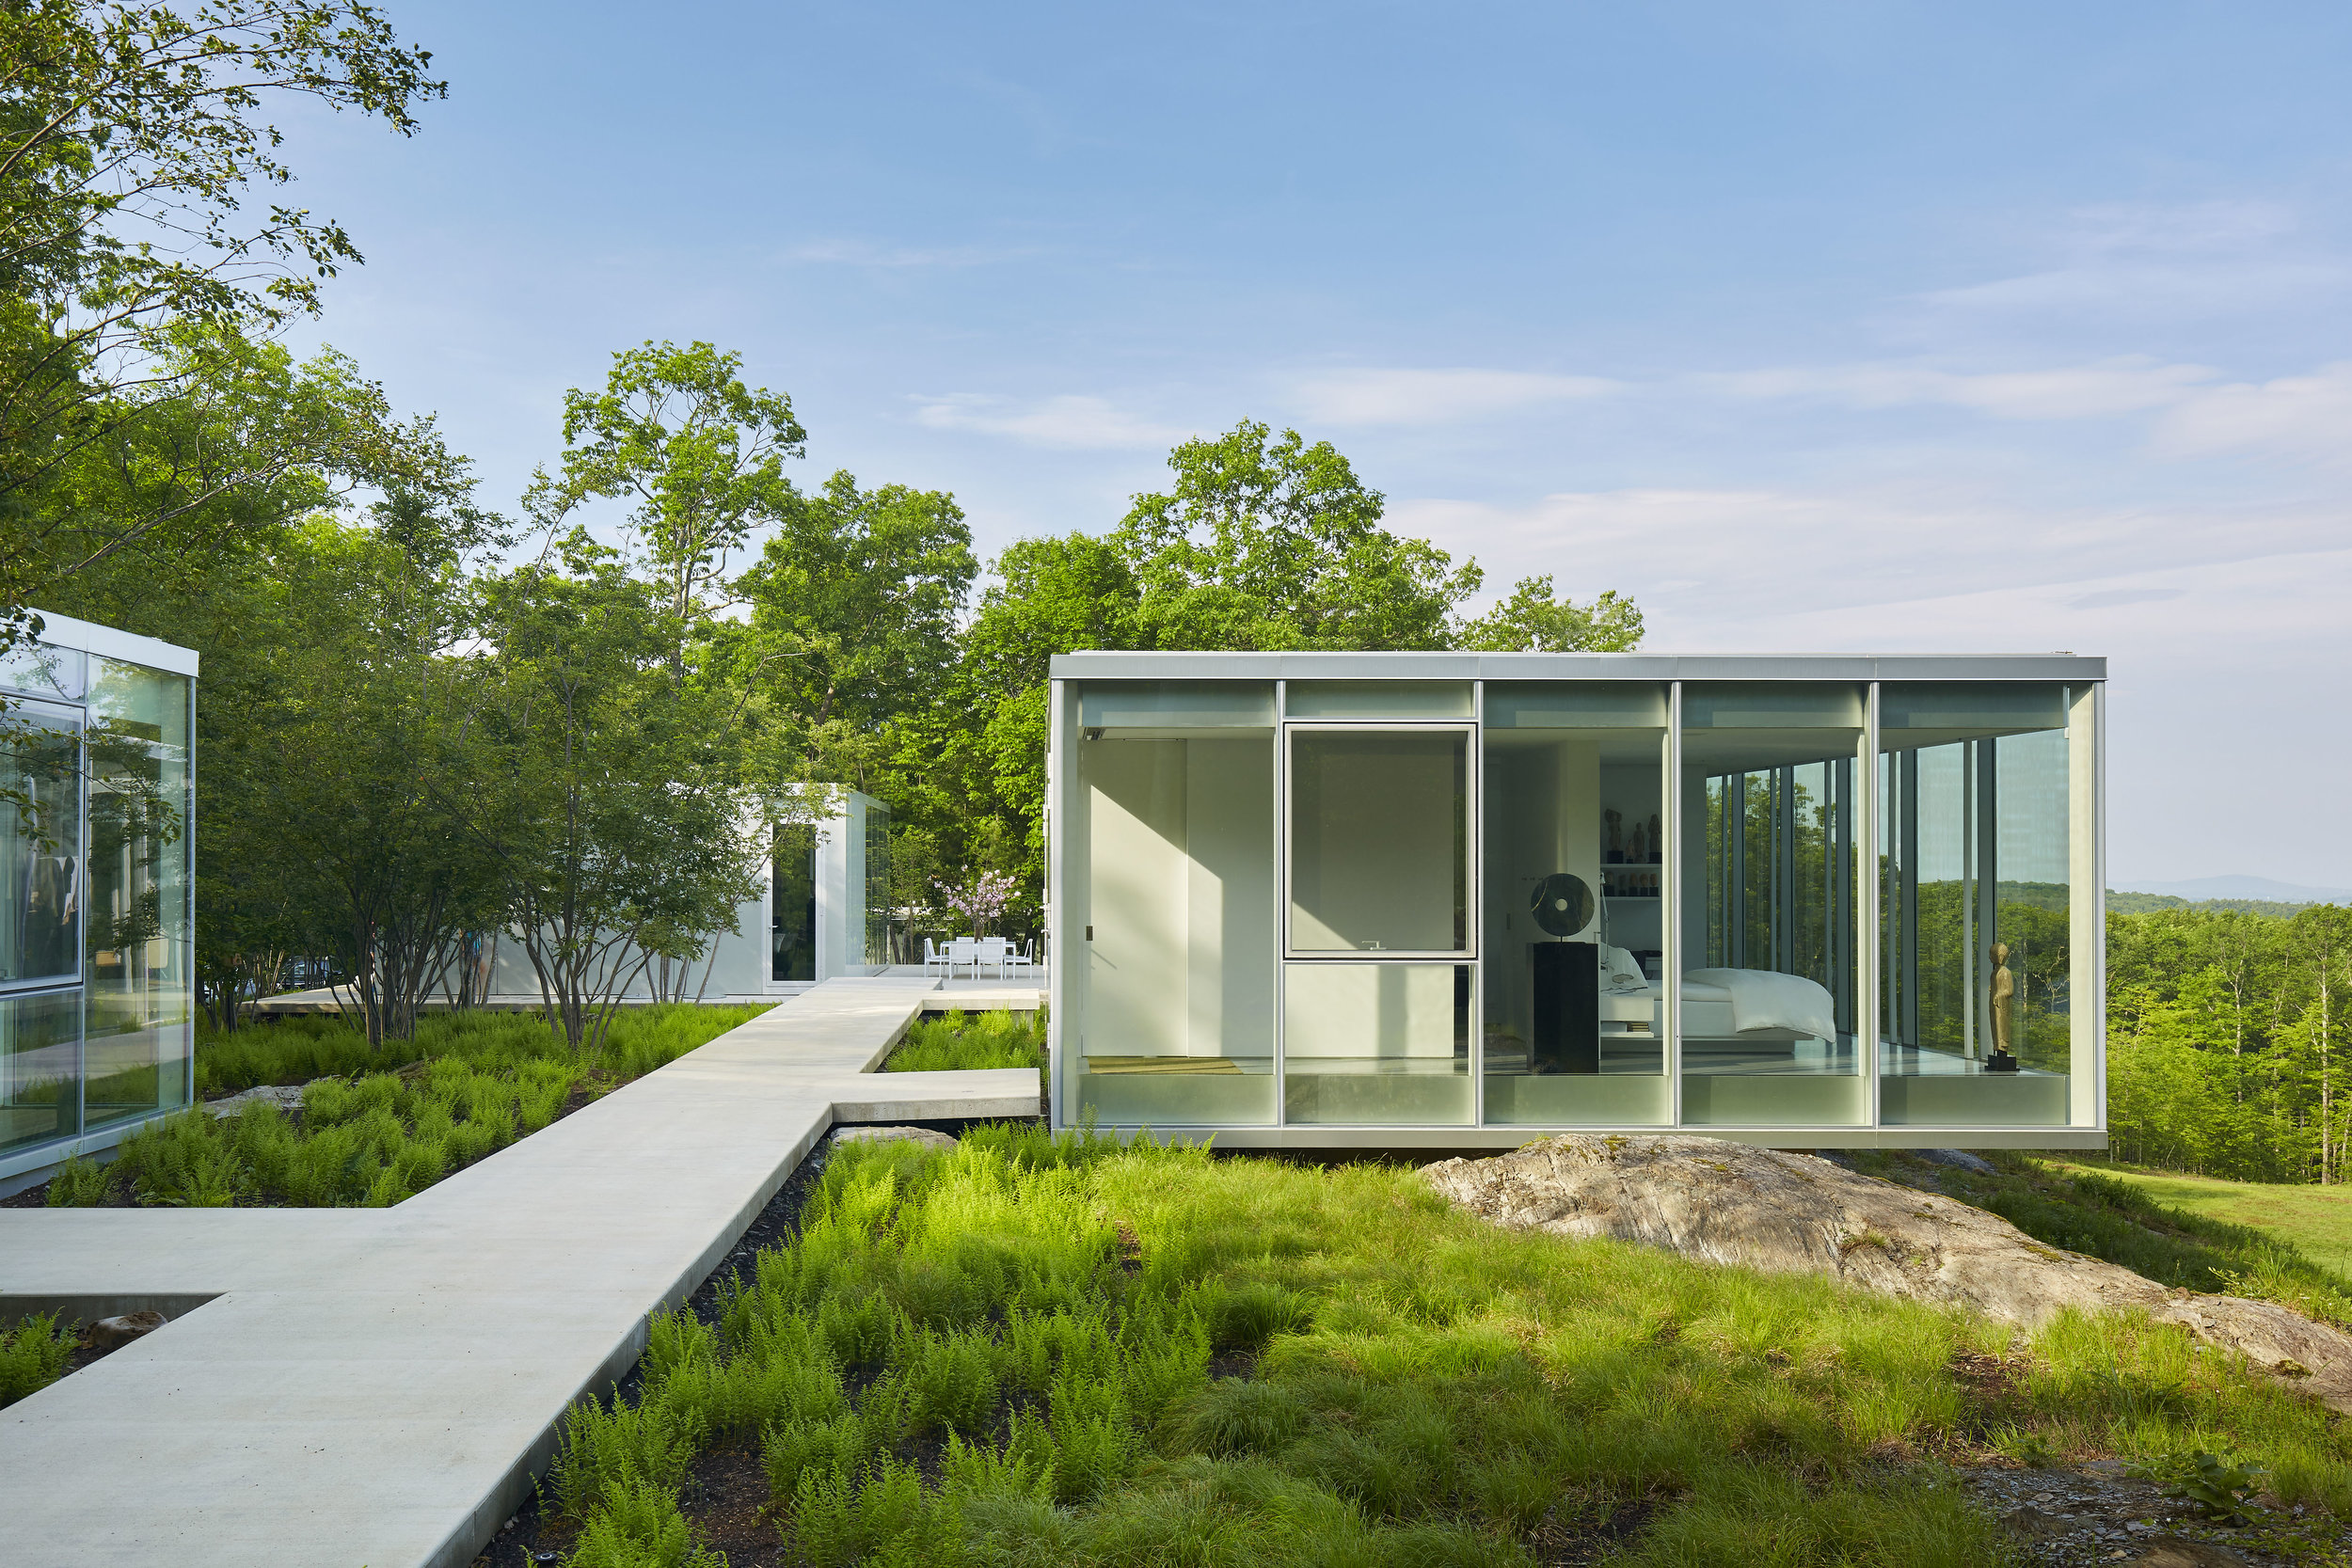 Toshiko Mori House on a Hill